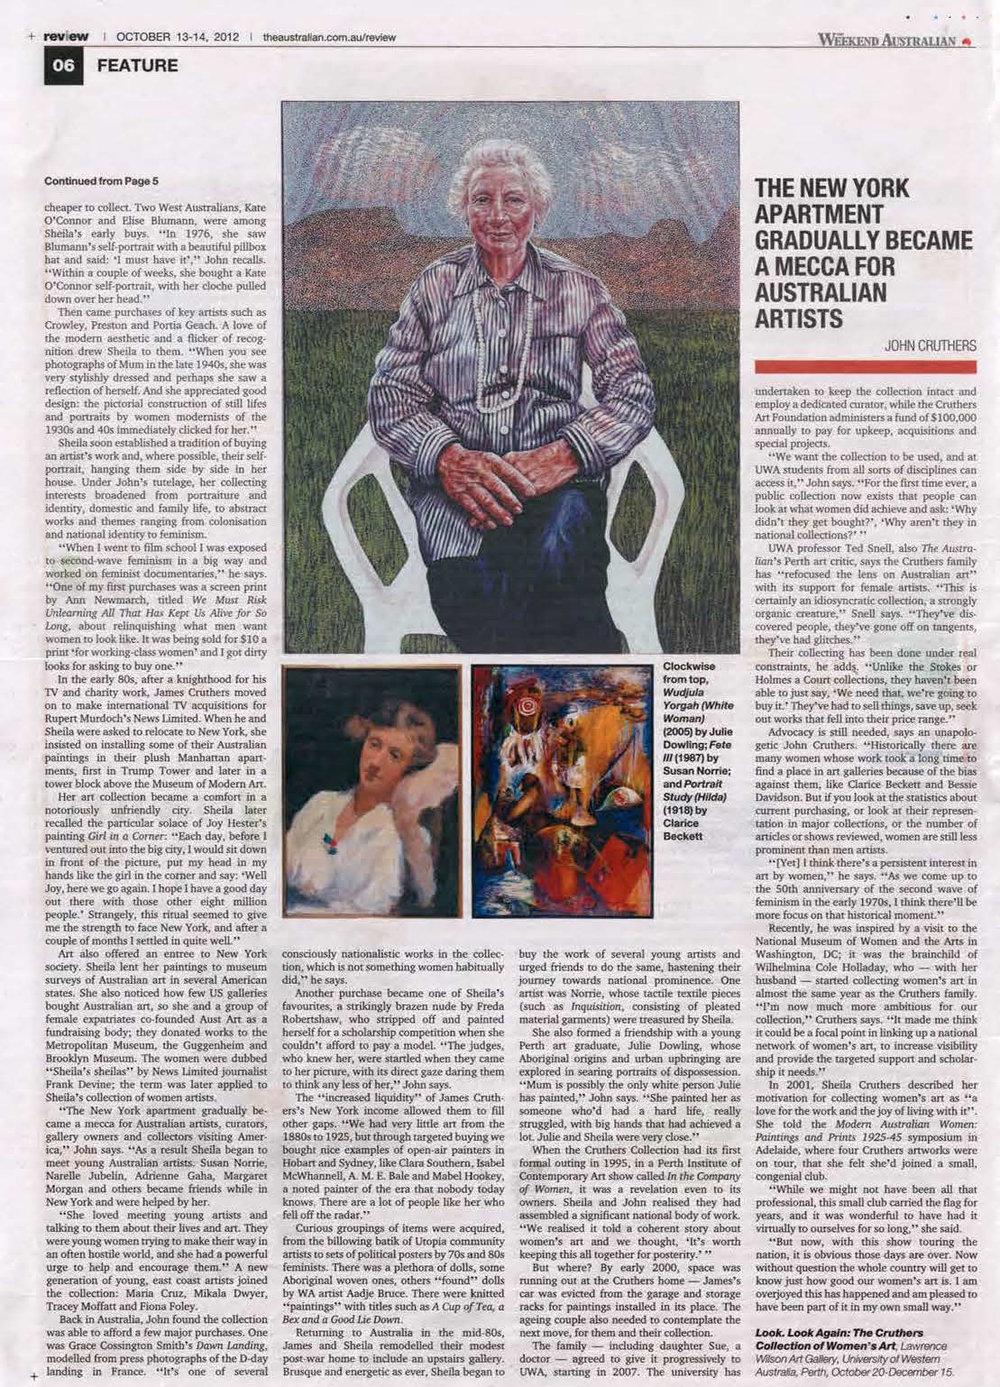 WeekendAustralian-p5-6_13-14Ot2012 2.jpg